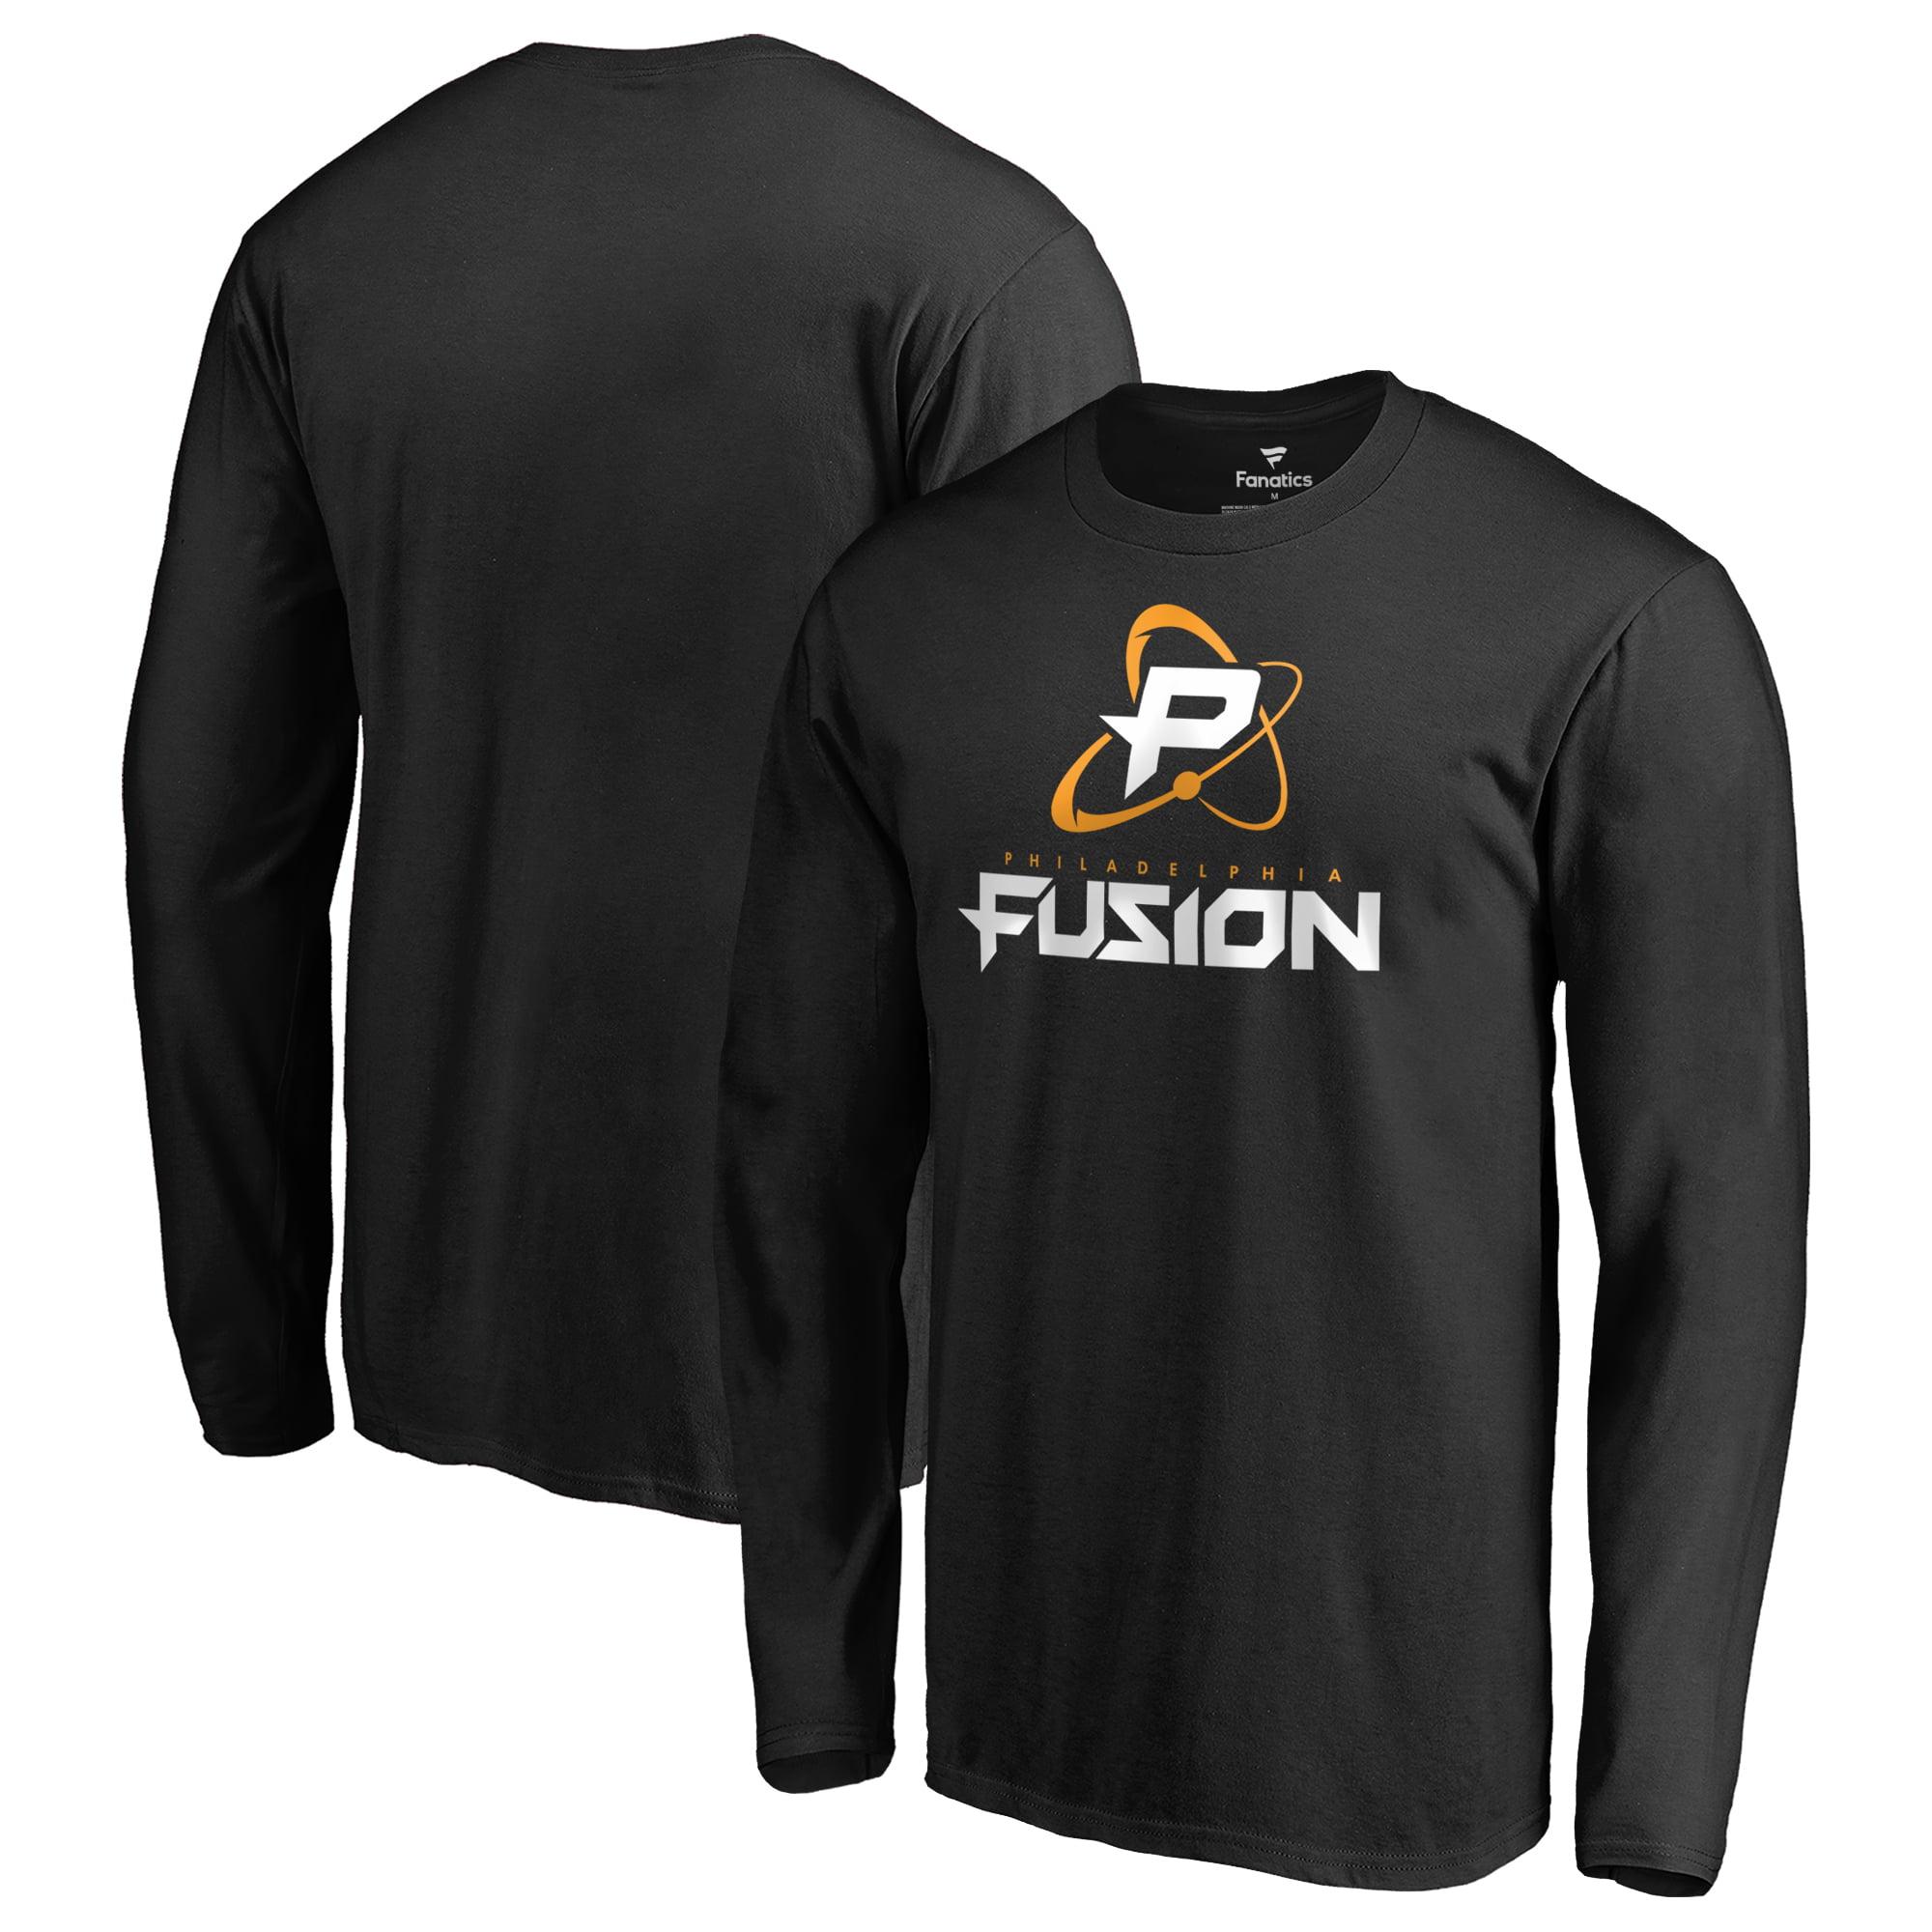 Philadelphia Fusion Fanatics Branded Team Identity Long Sleeve T-Shirt - Black